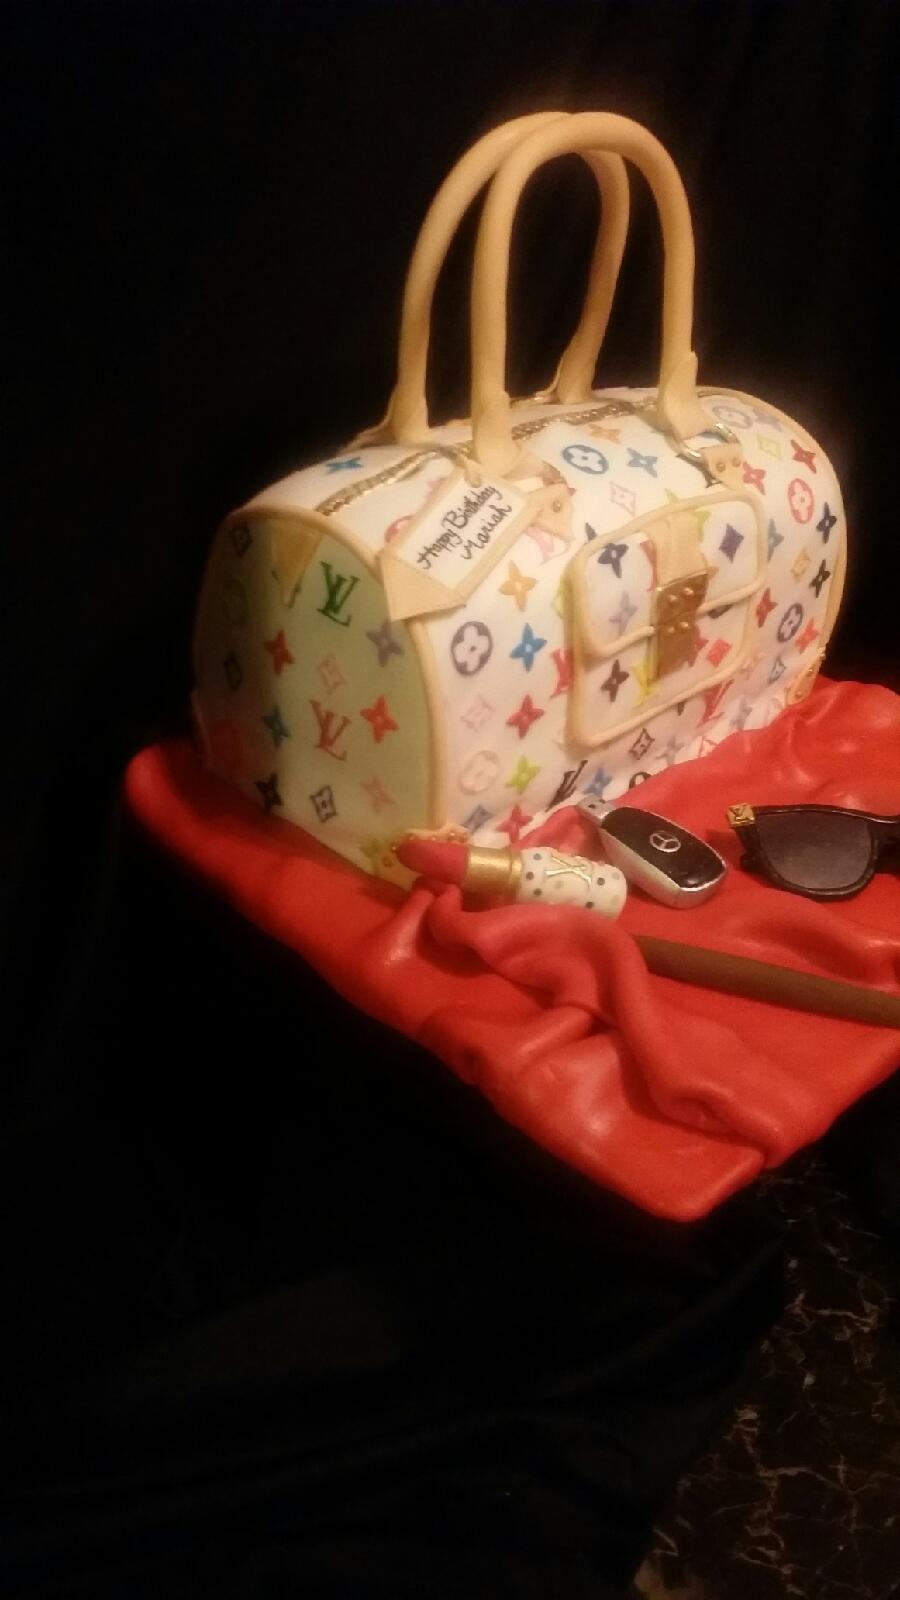 Louis Vuitton Purse Cake - CakeCentral.com